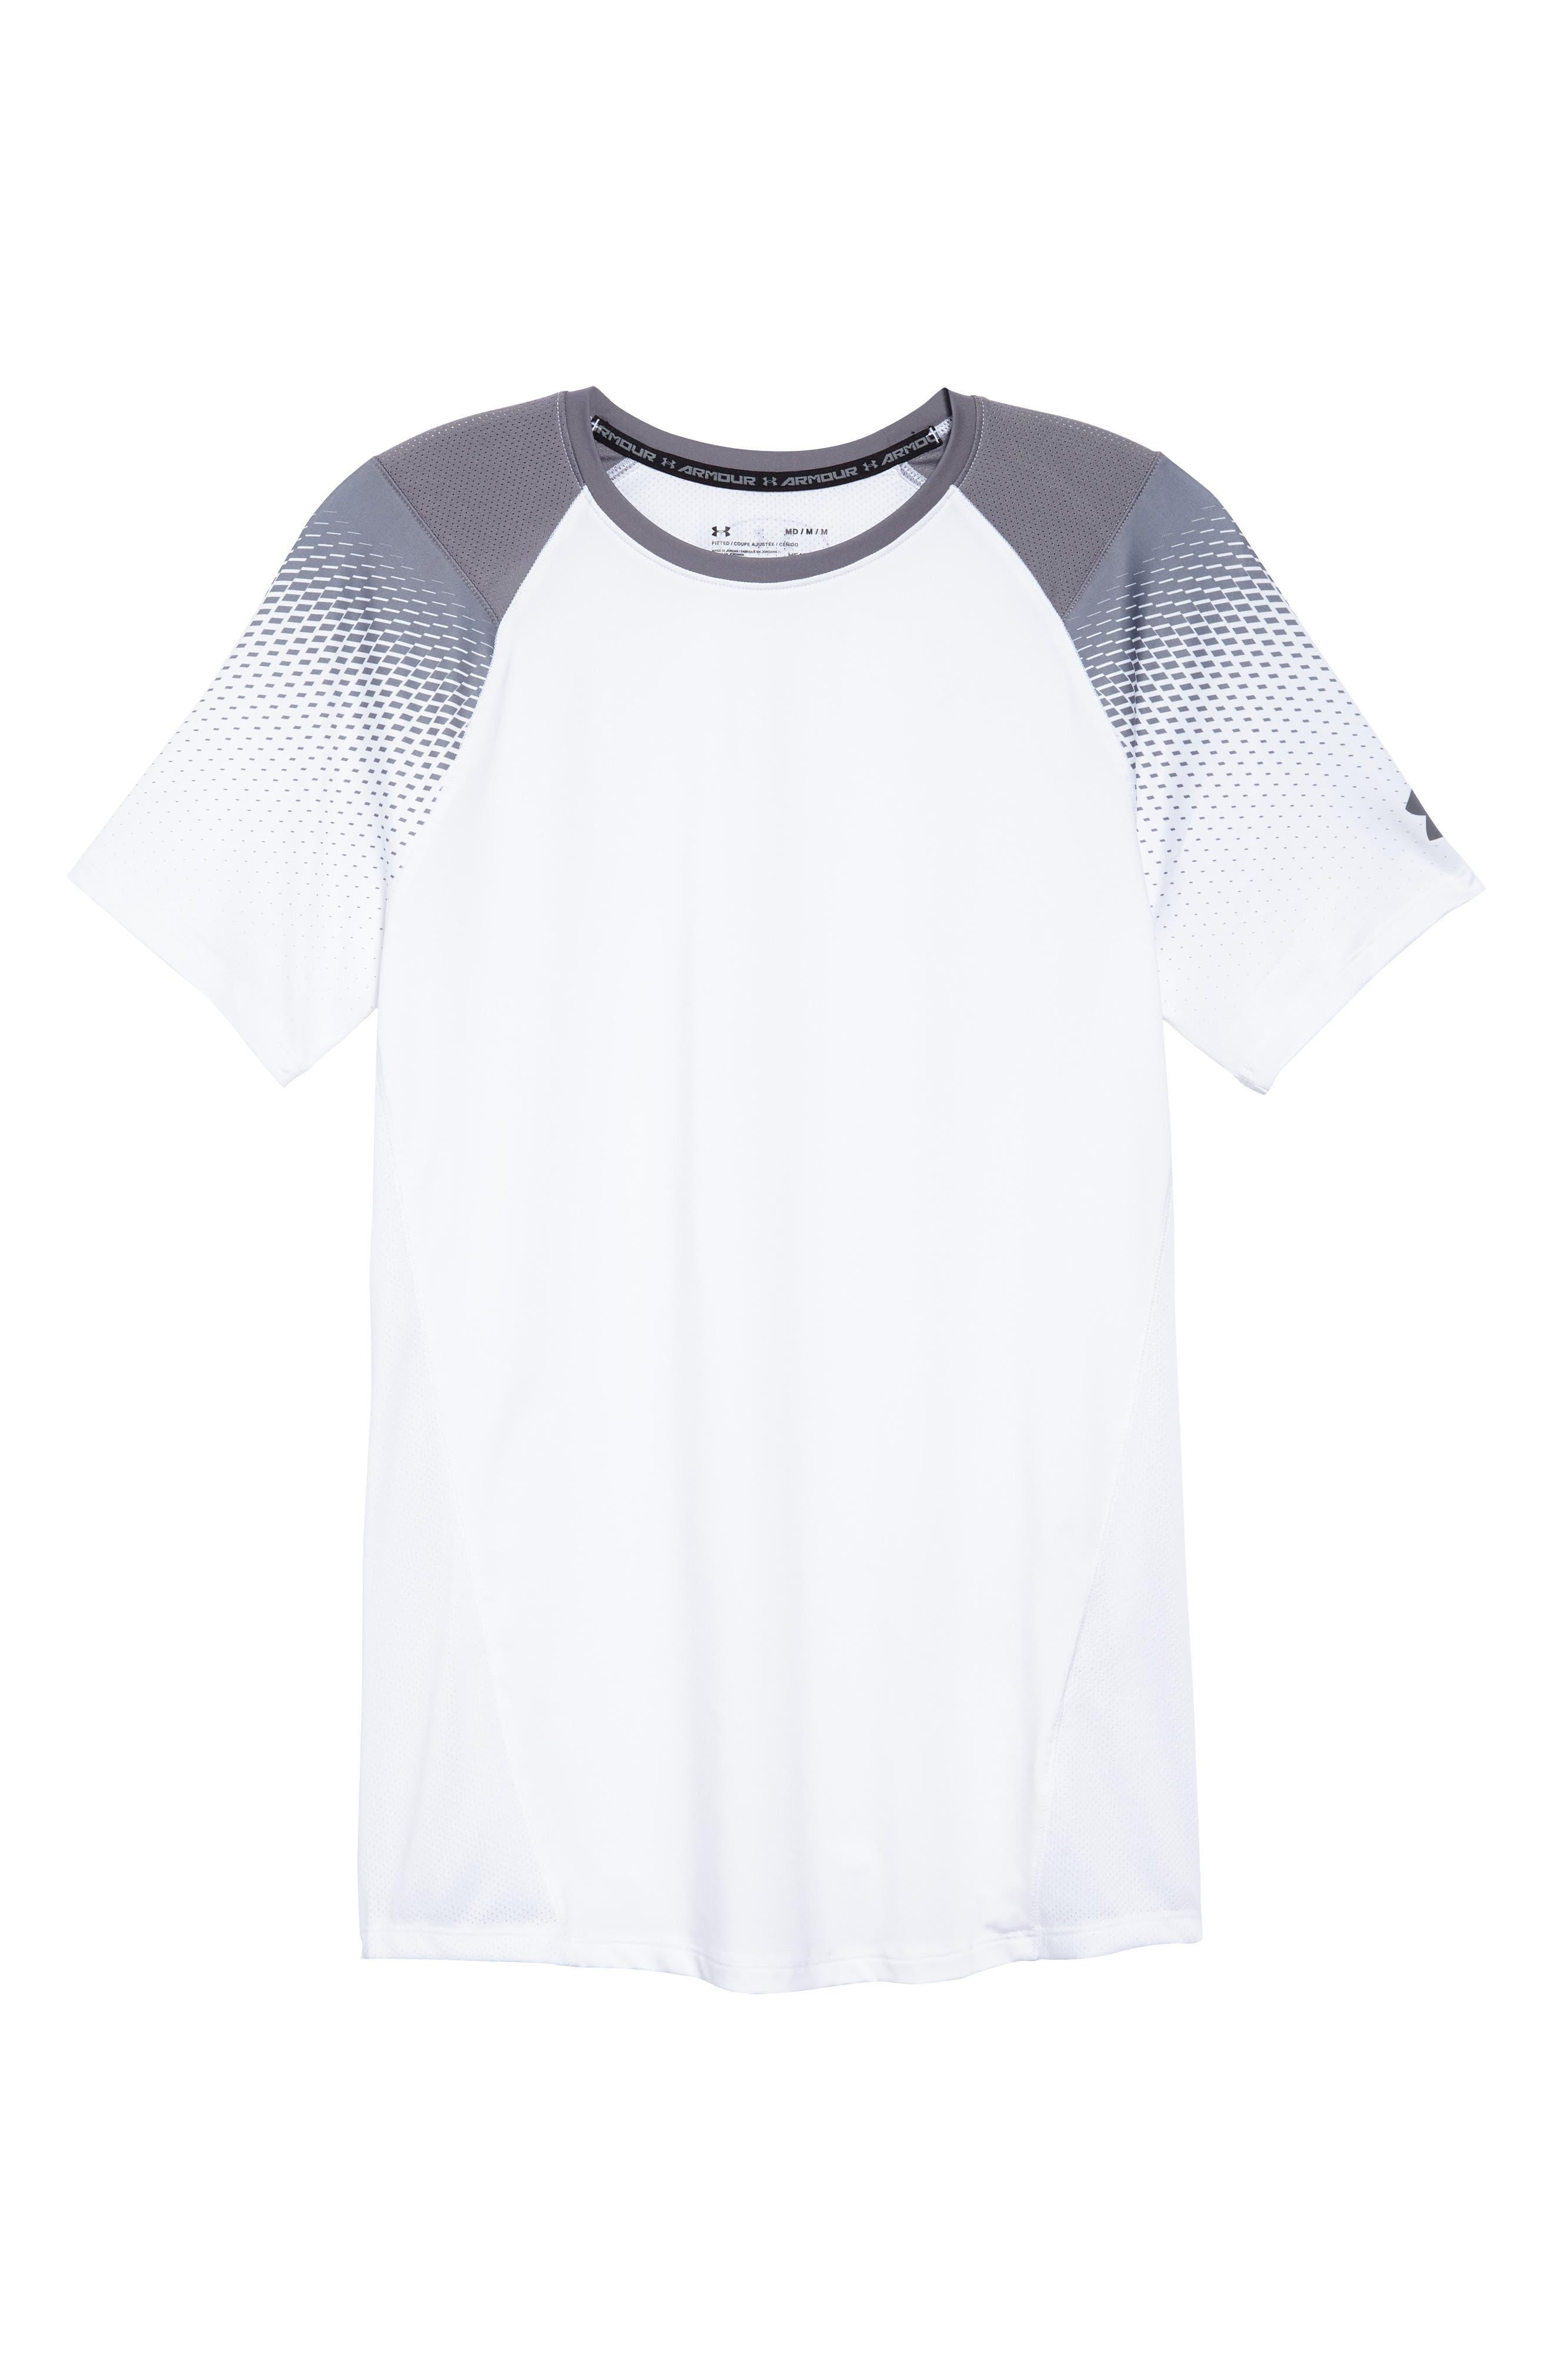 MK1 Dash Print Crewneck T-Shirt,                             Alternate thumbnail 6, color,                             WHITE / ZINC GREH / GRAPHITE